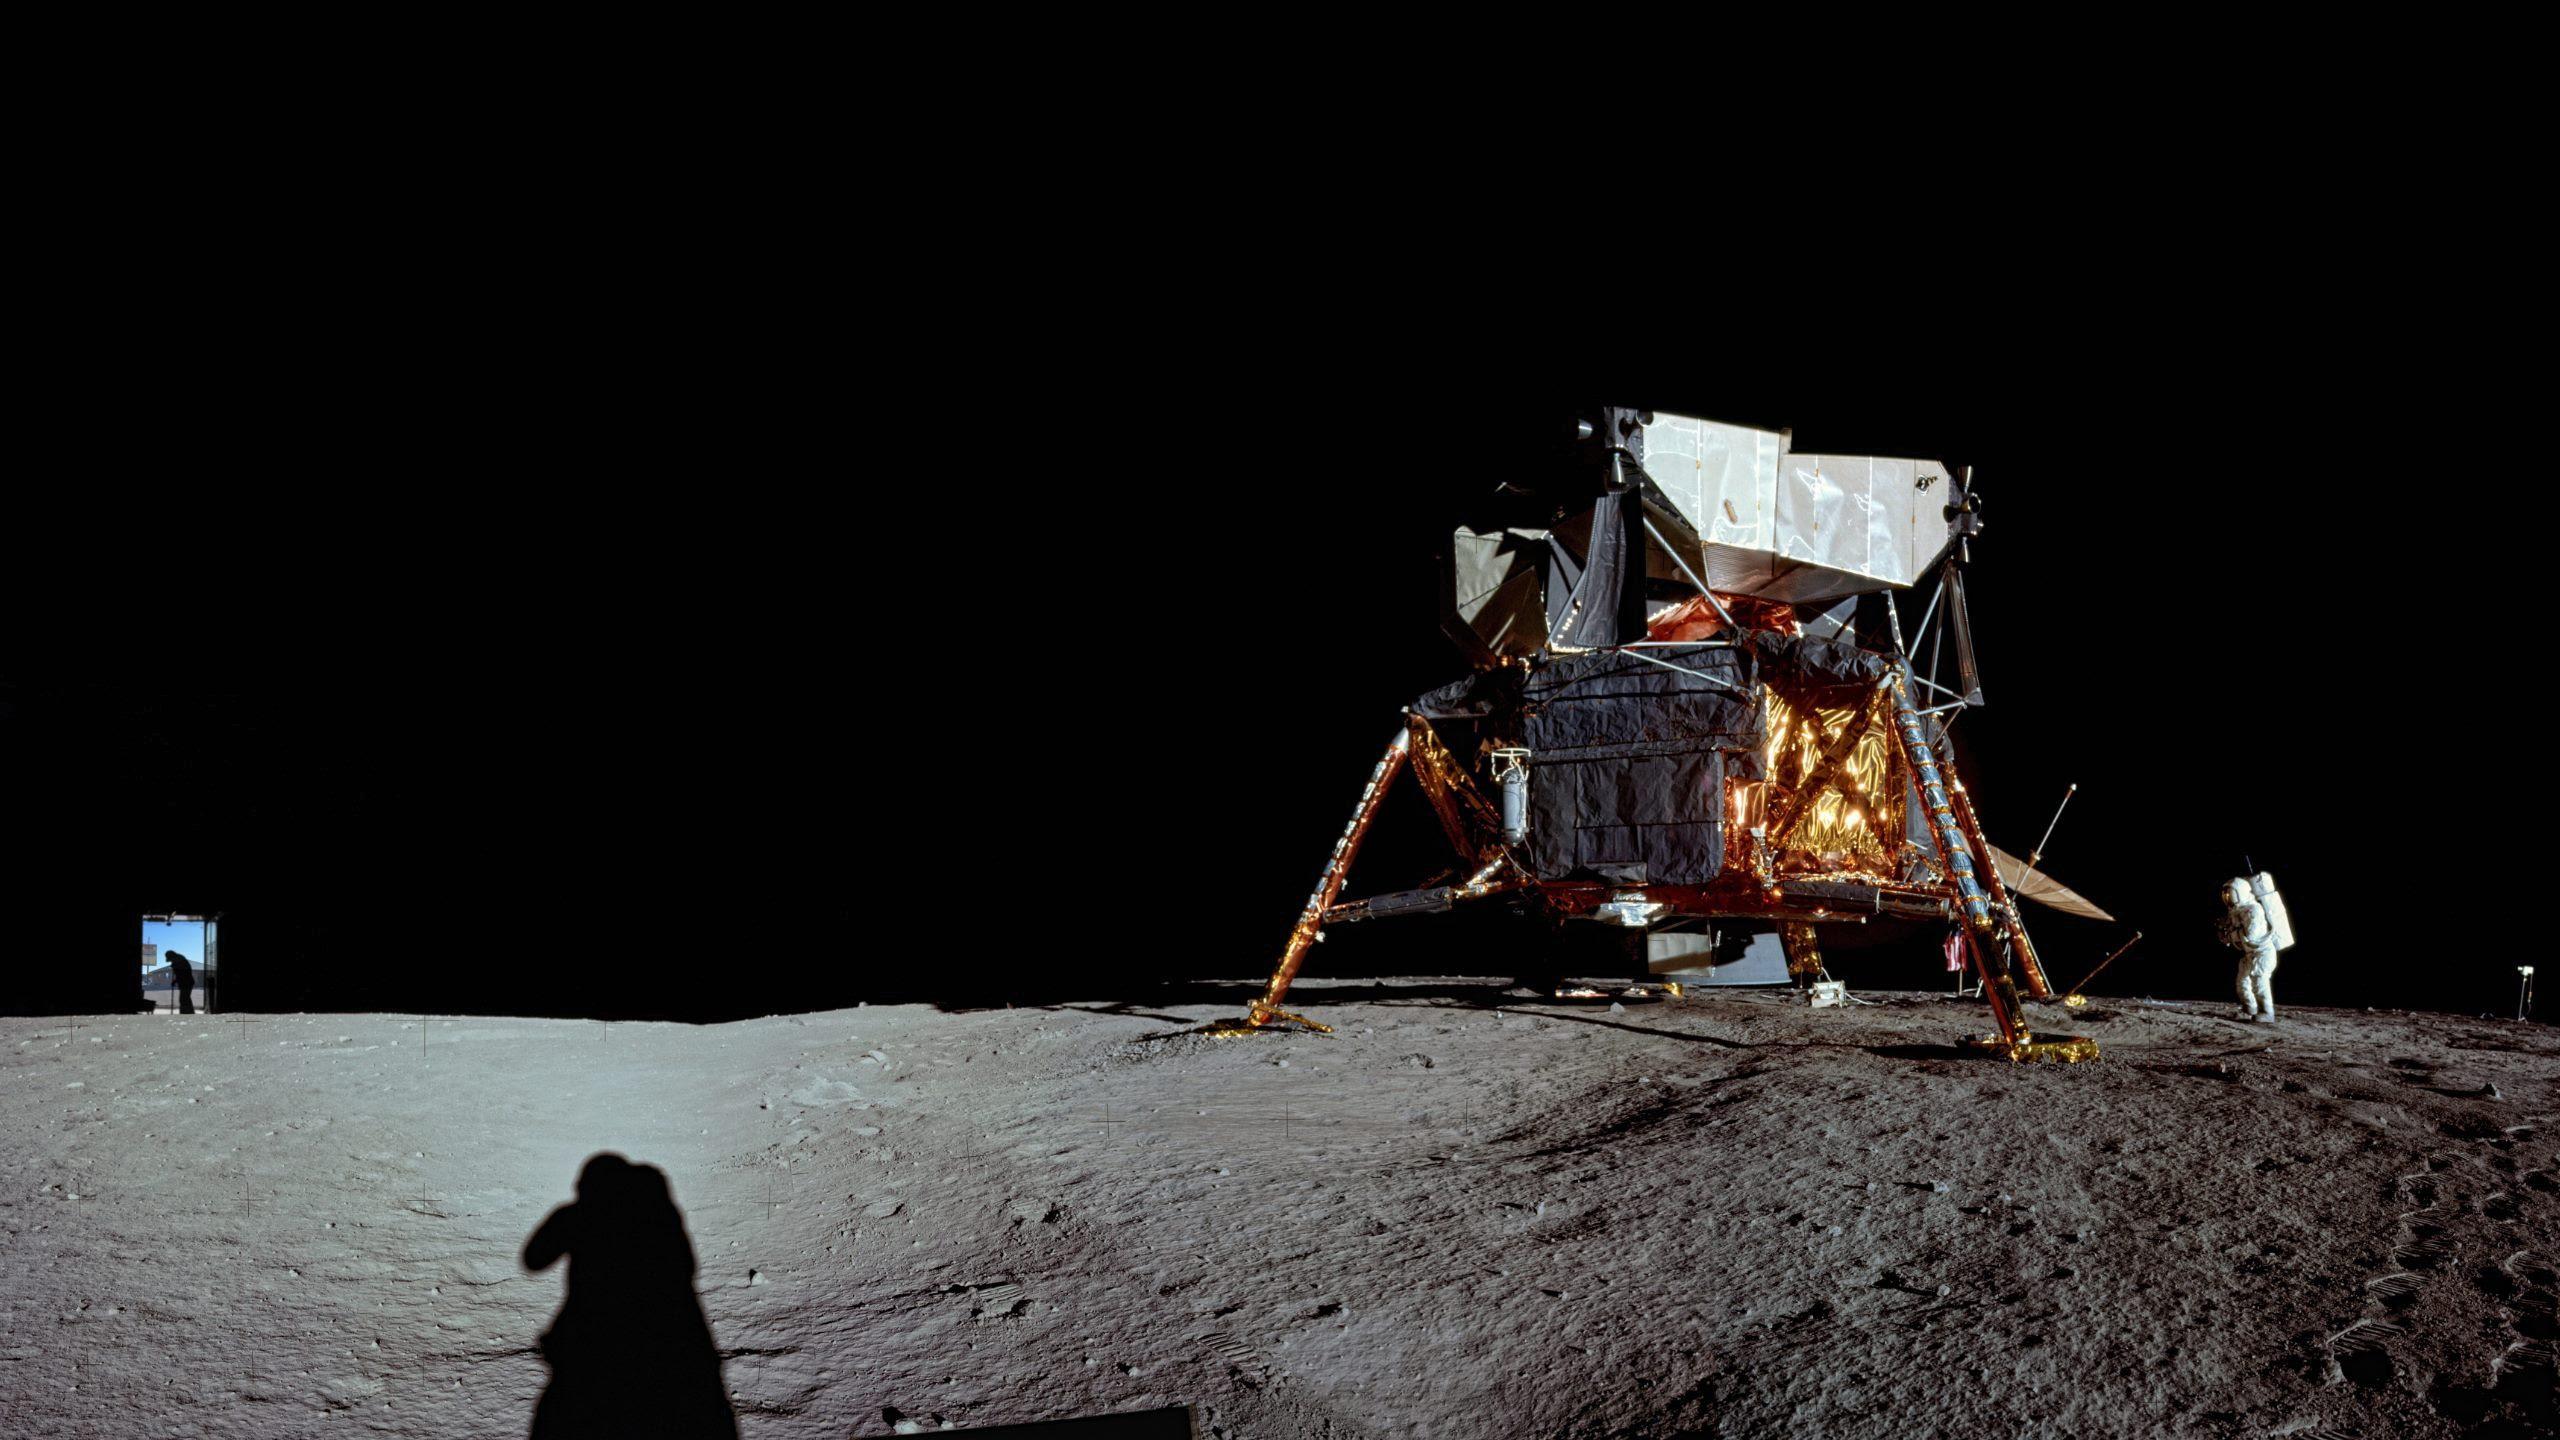 Apollo Moon Landing [2560x1440] : wallpapers